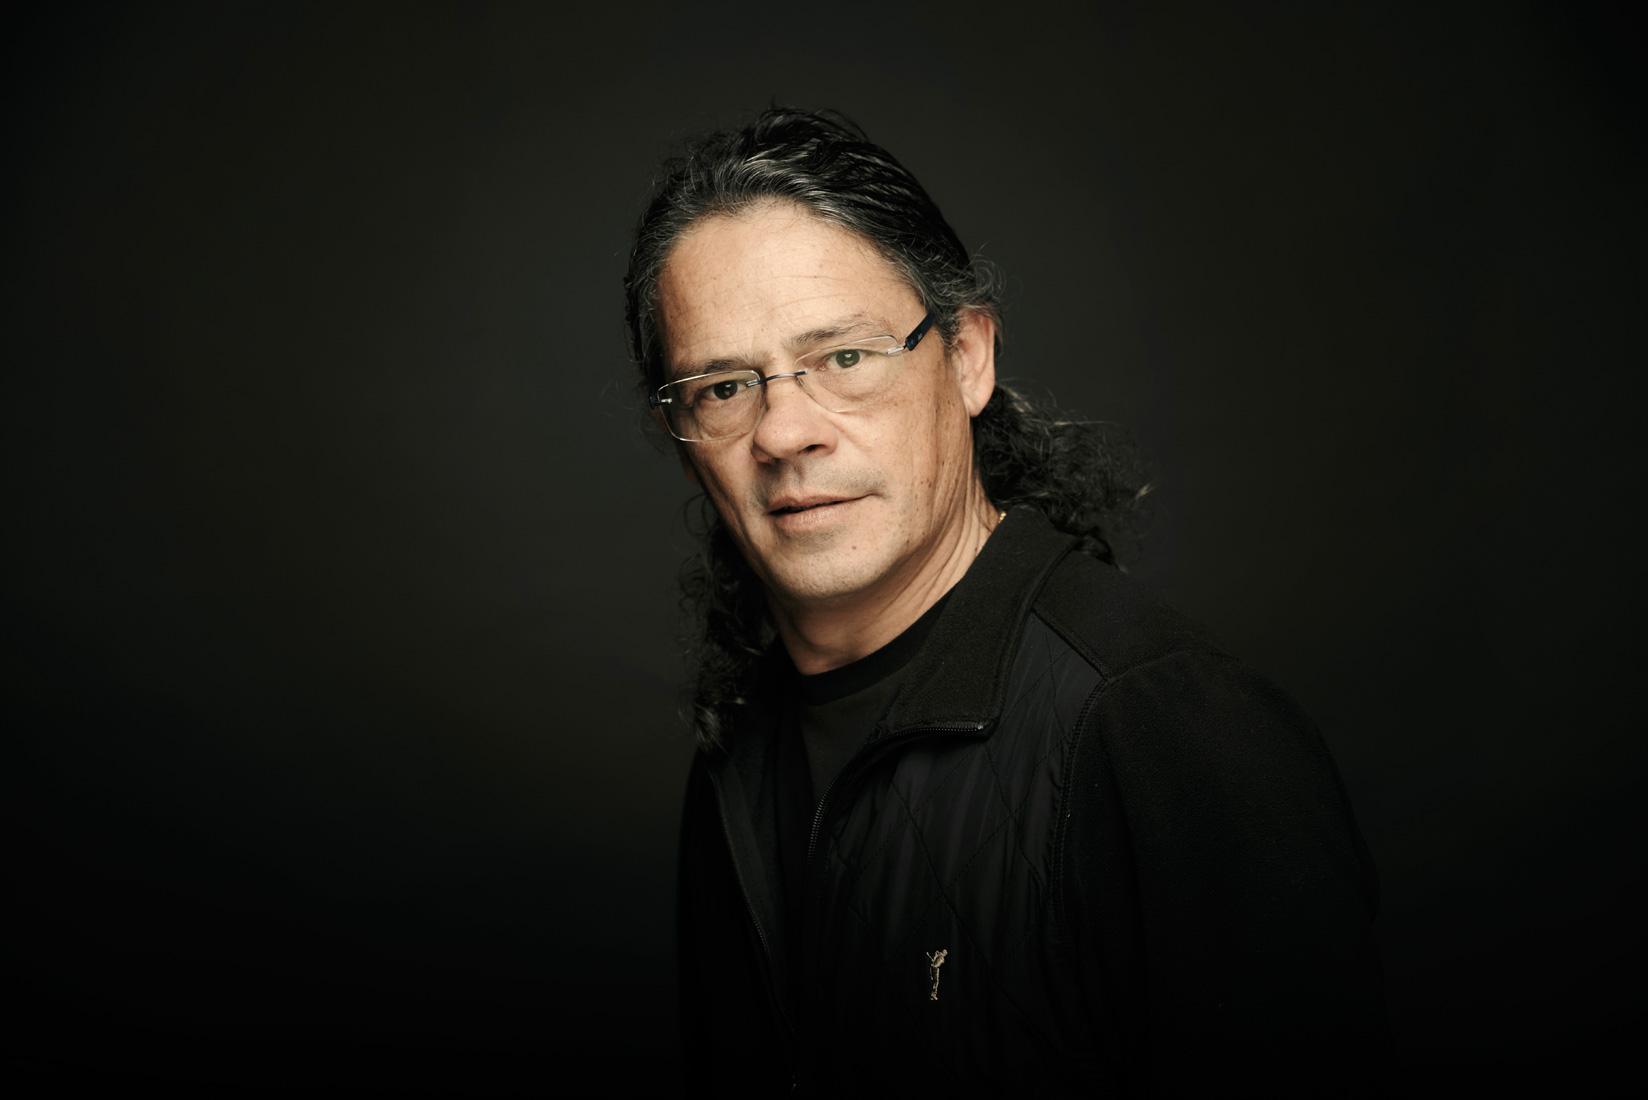 Juanjo Mercadal